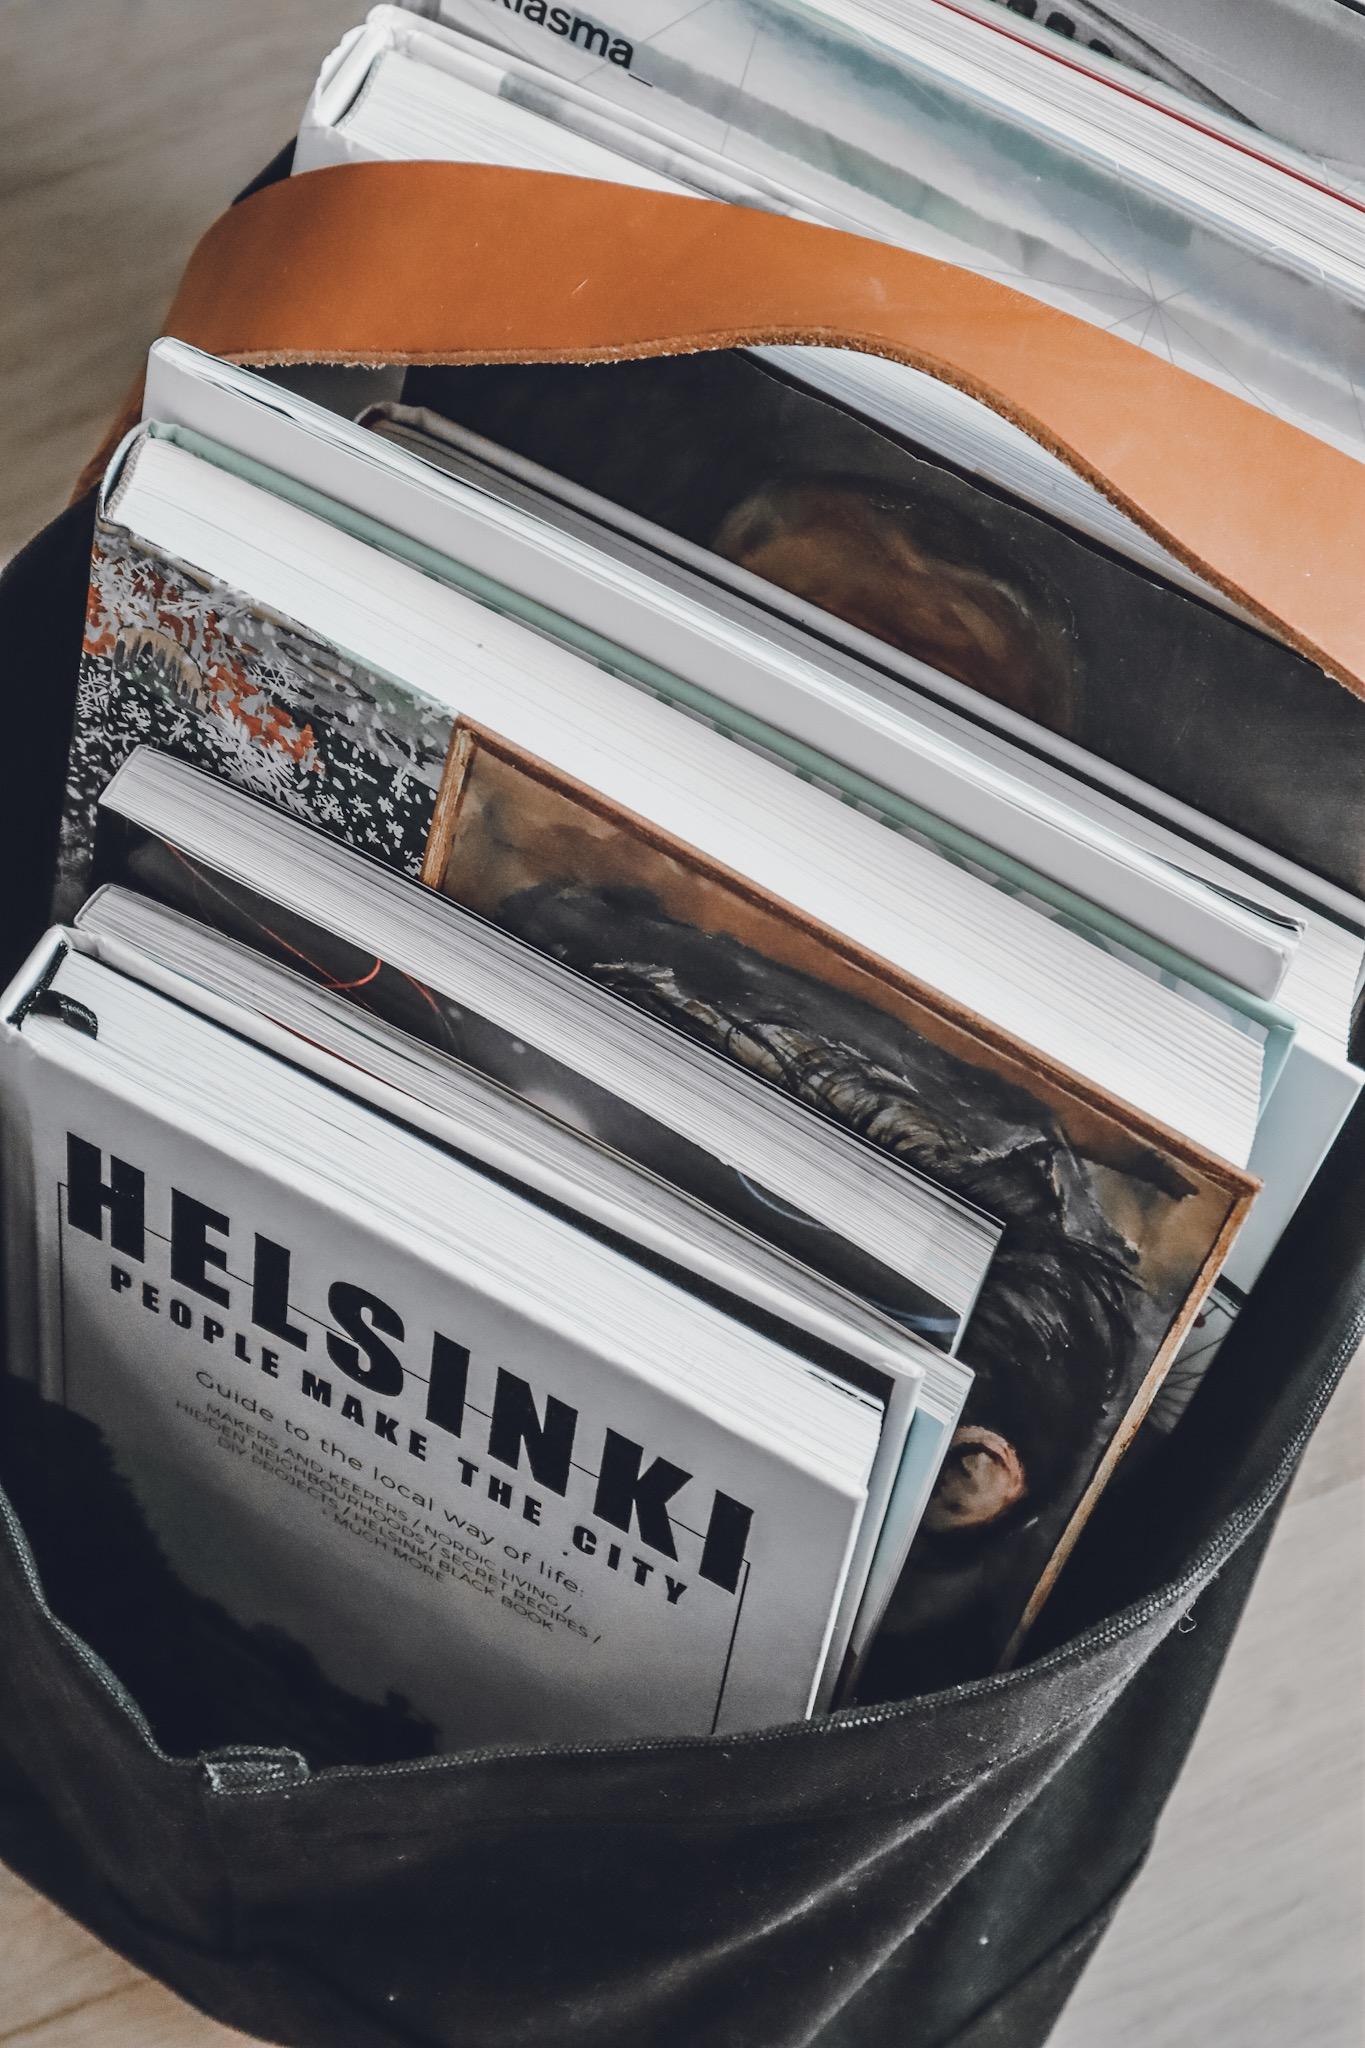 Helsinki dove dormire